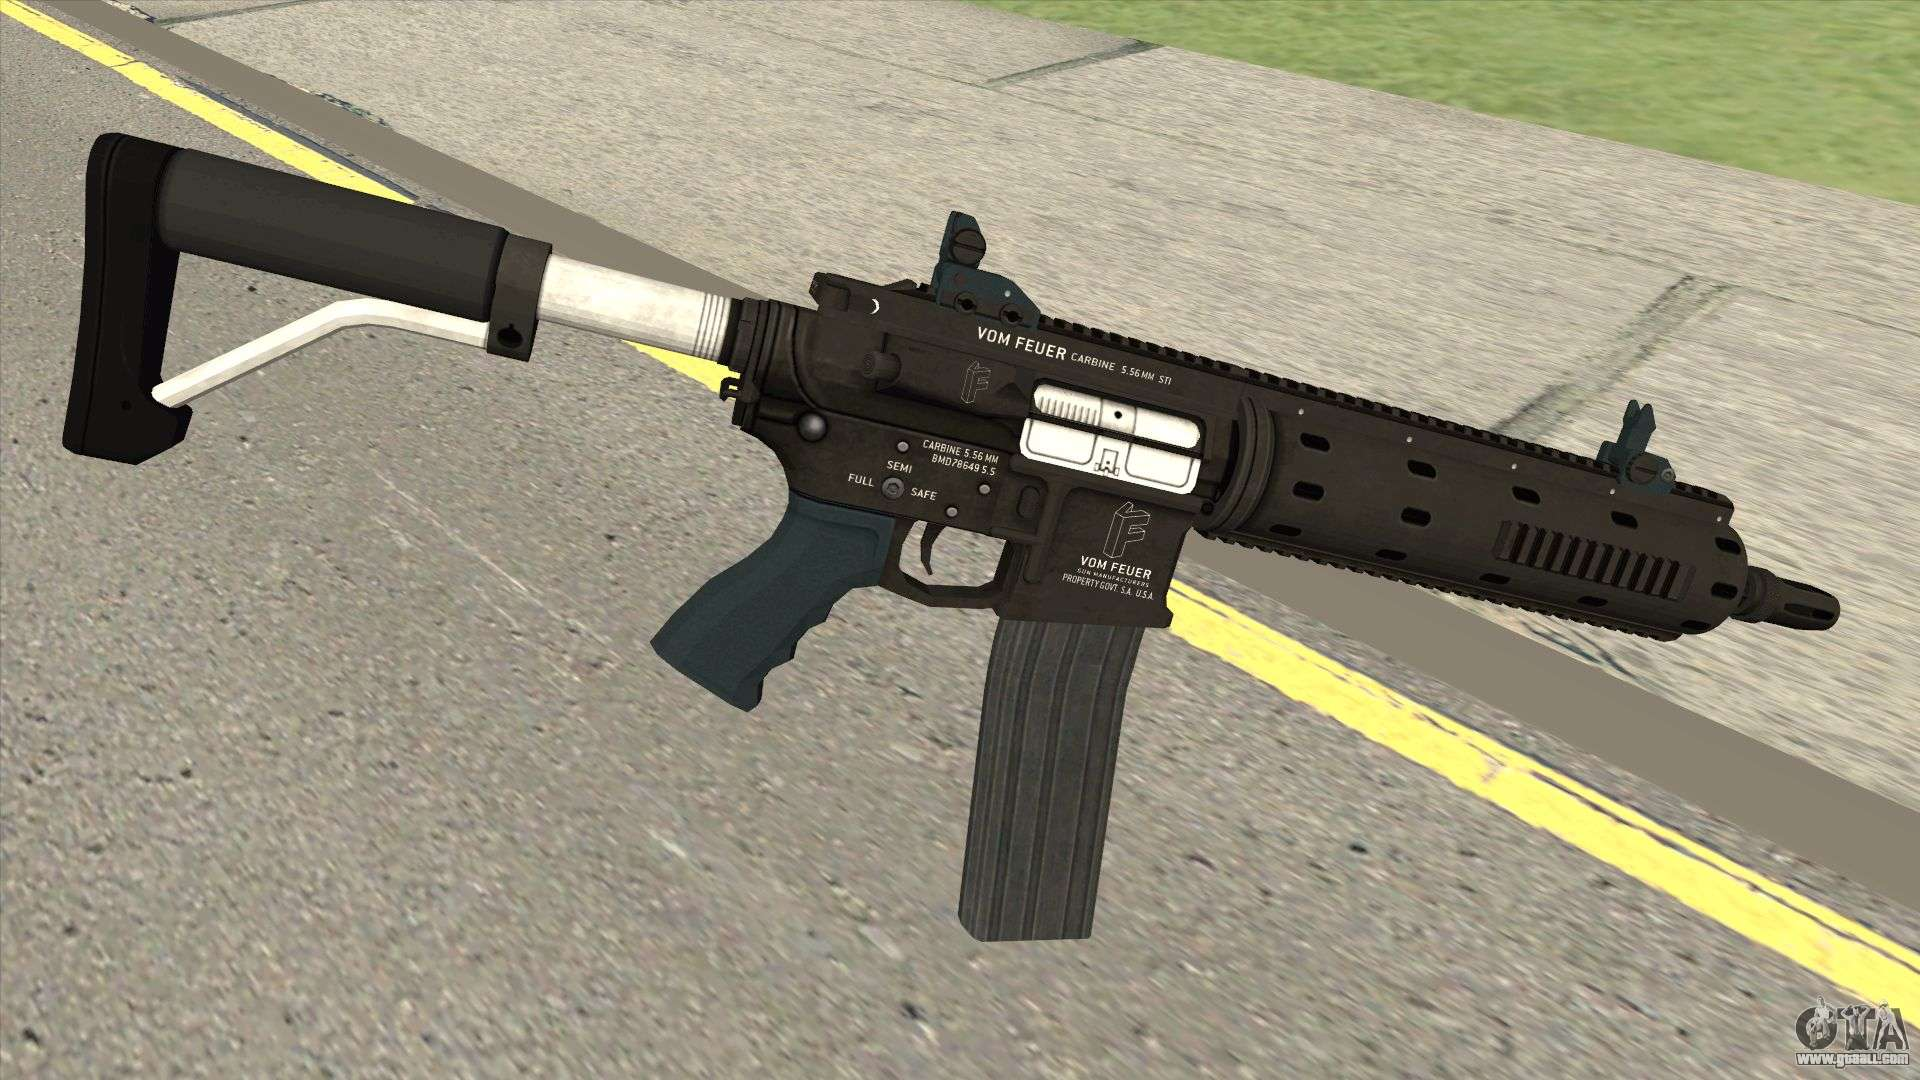 Vom Feuer Carbine Rifle GTA V (Extended Clip) For GTA San